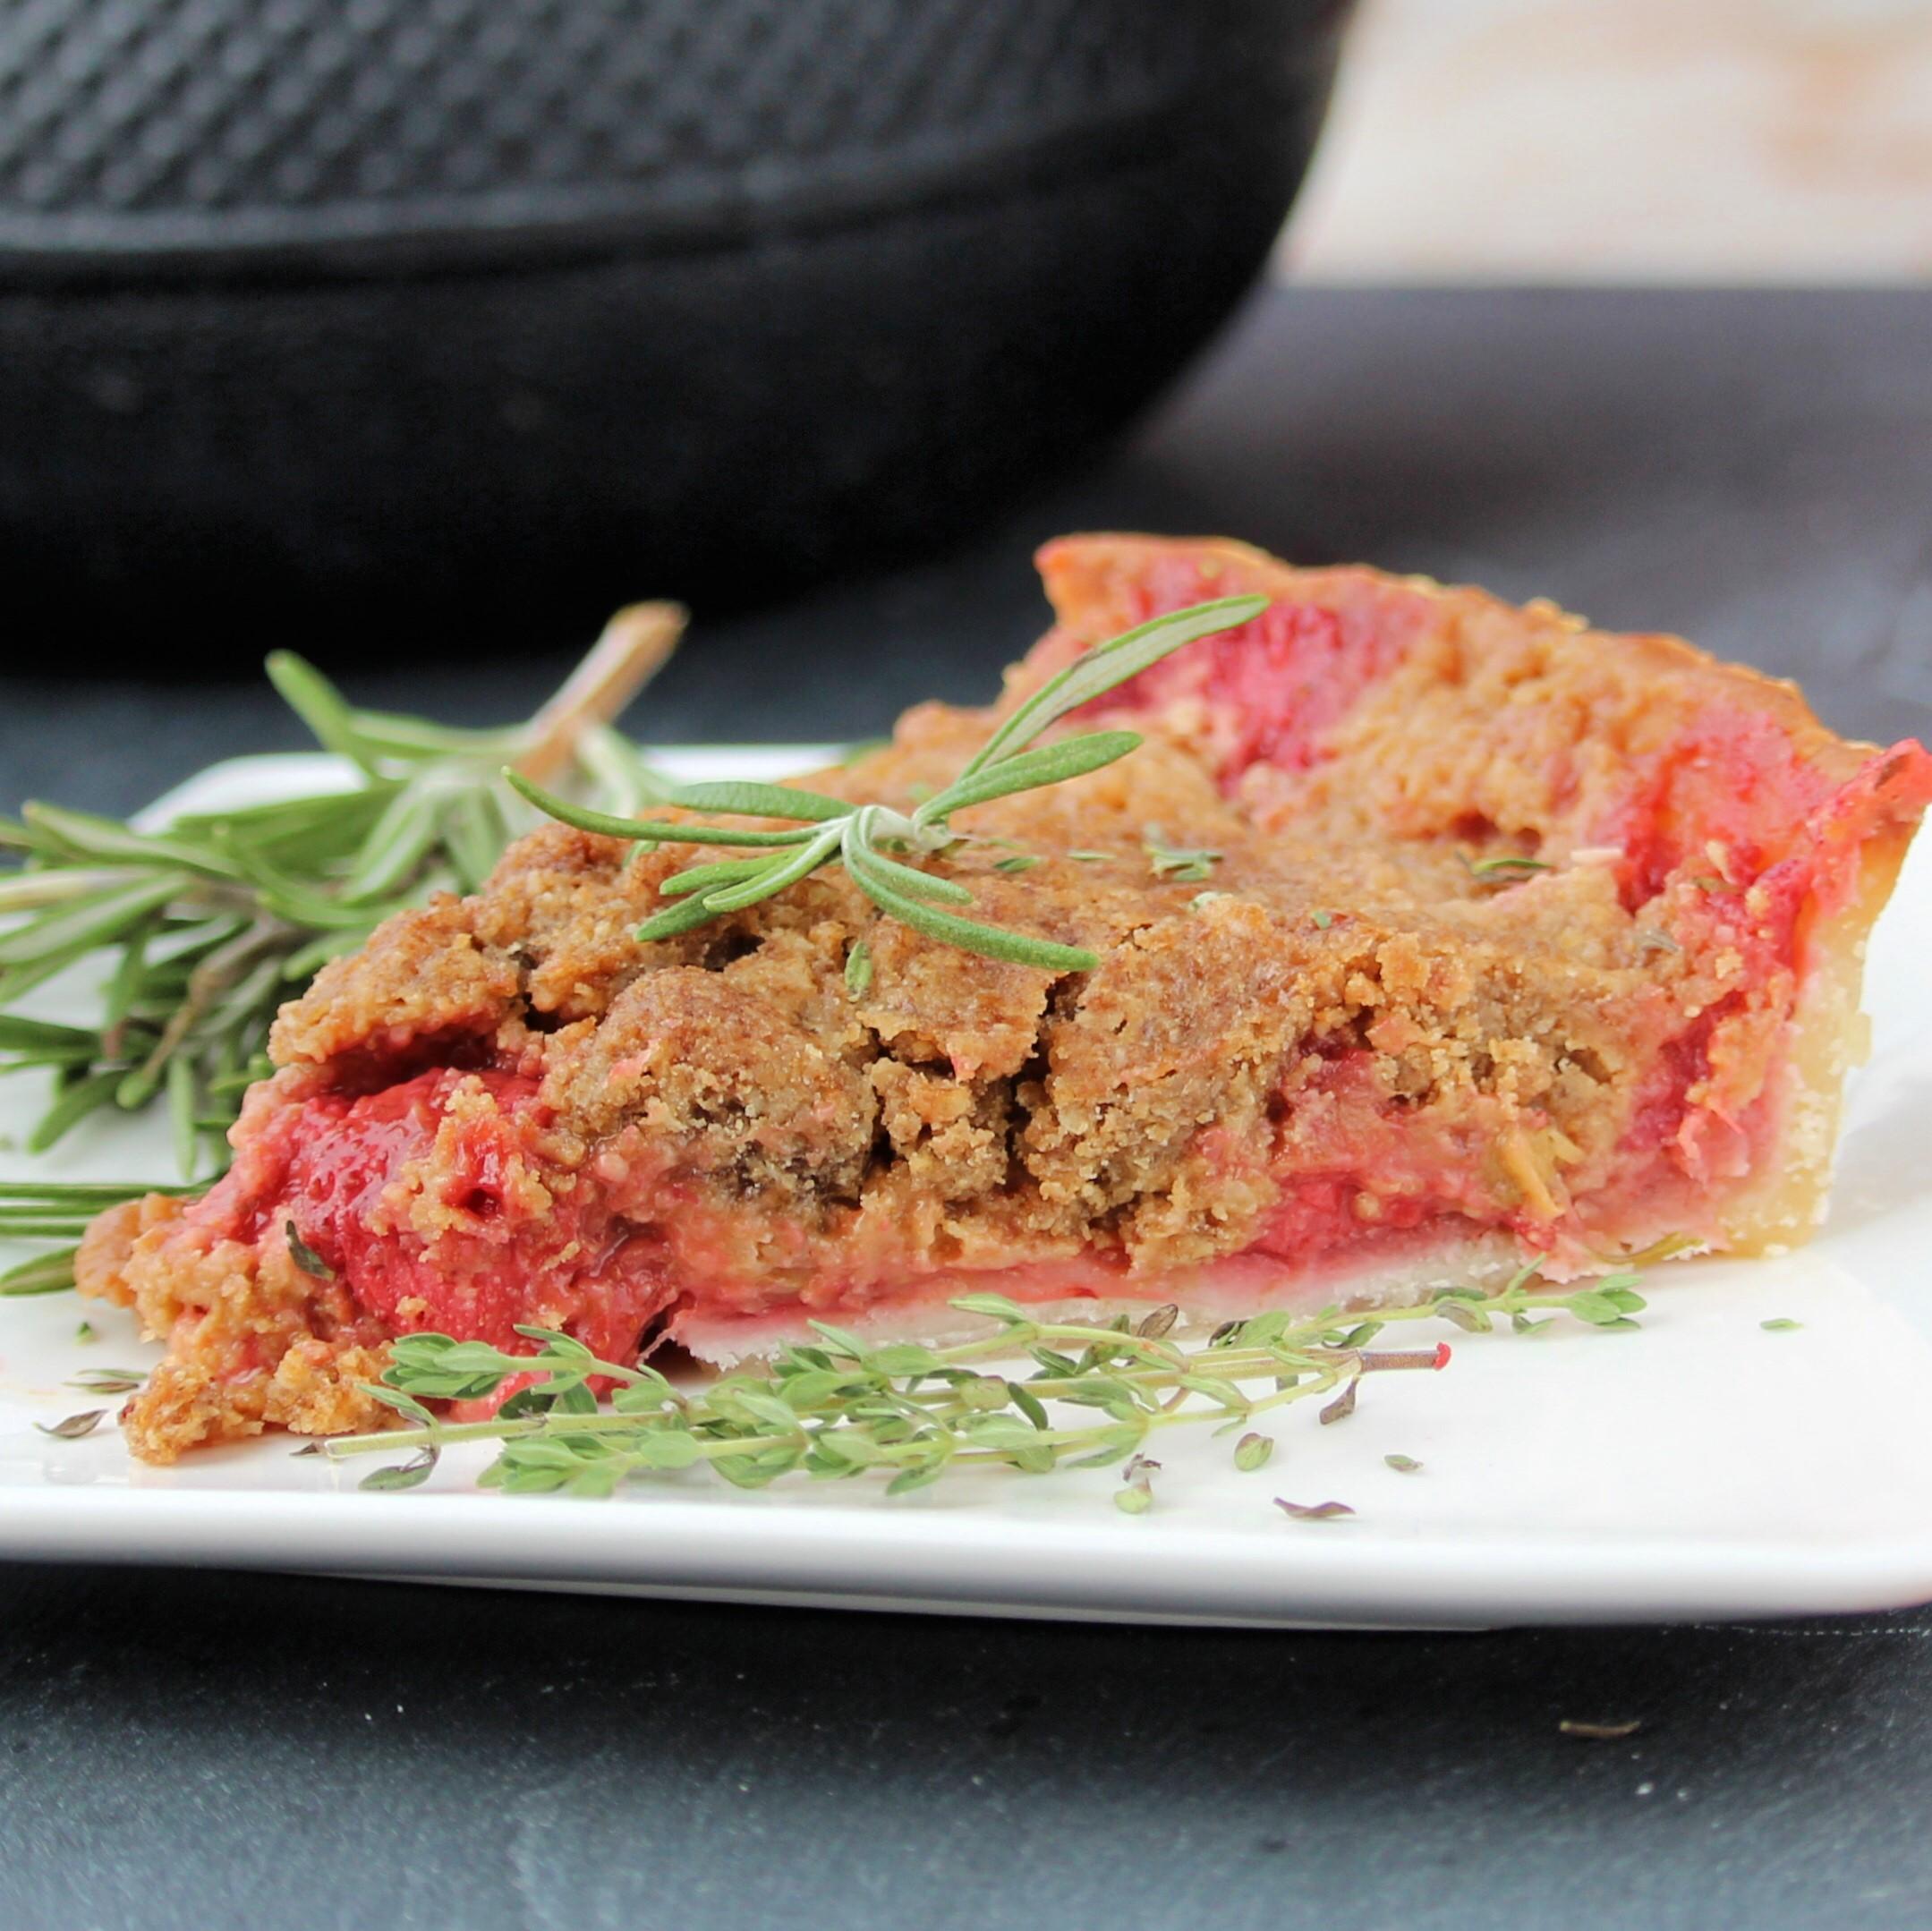 Rhubarb-Strawberry Herb Crumble Pie